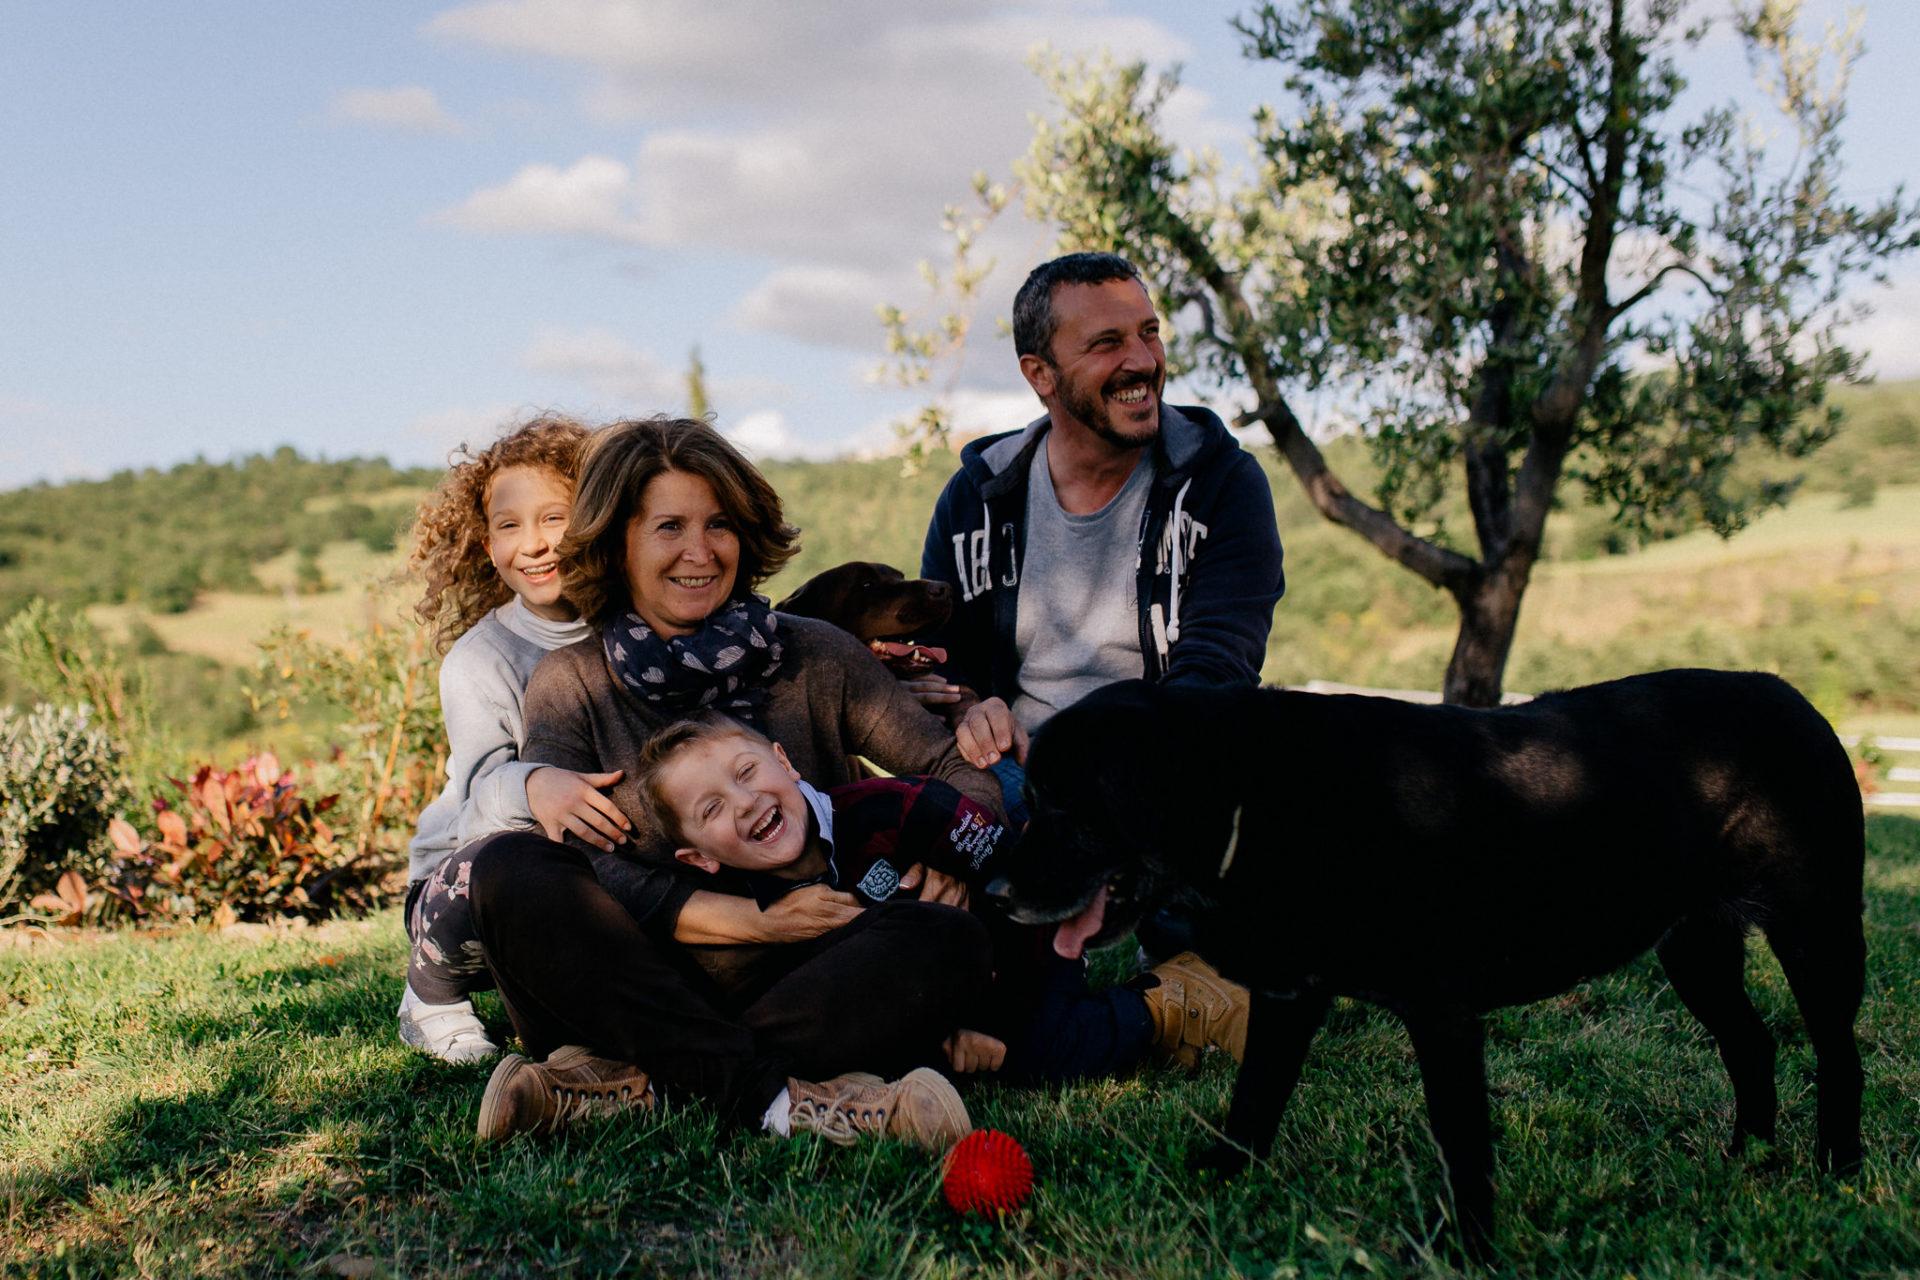 family photos holiday tuscany-intimate natural family portrait-dimora santa margherita-travel italy-family photographer stuttgart